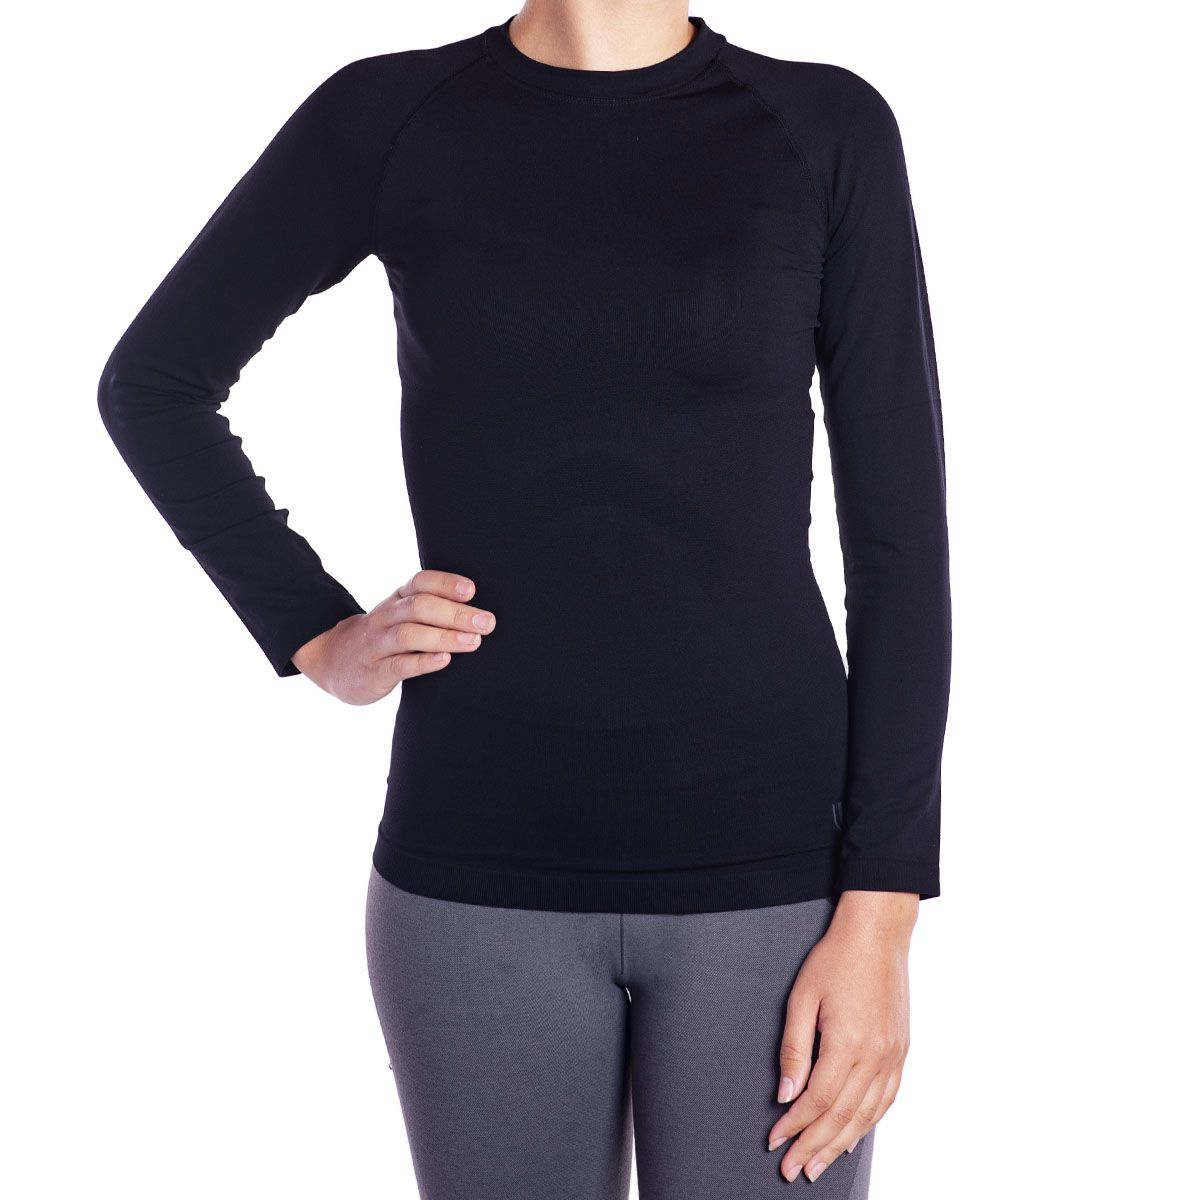 Camiseta Feminina Sem Costura Manga Longa Térmica i-max Lupo